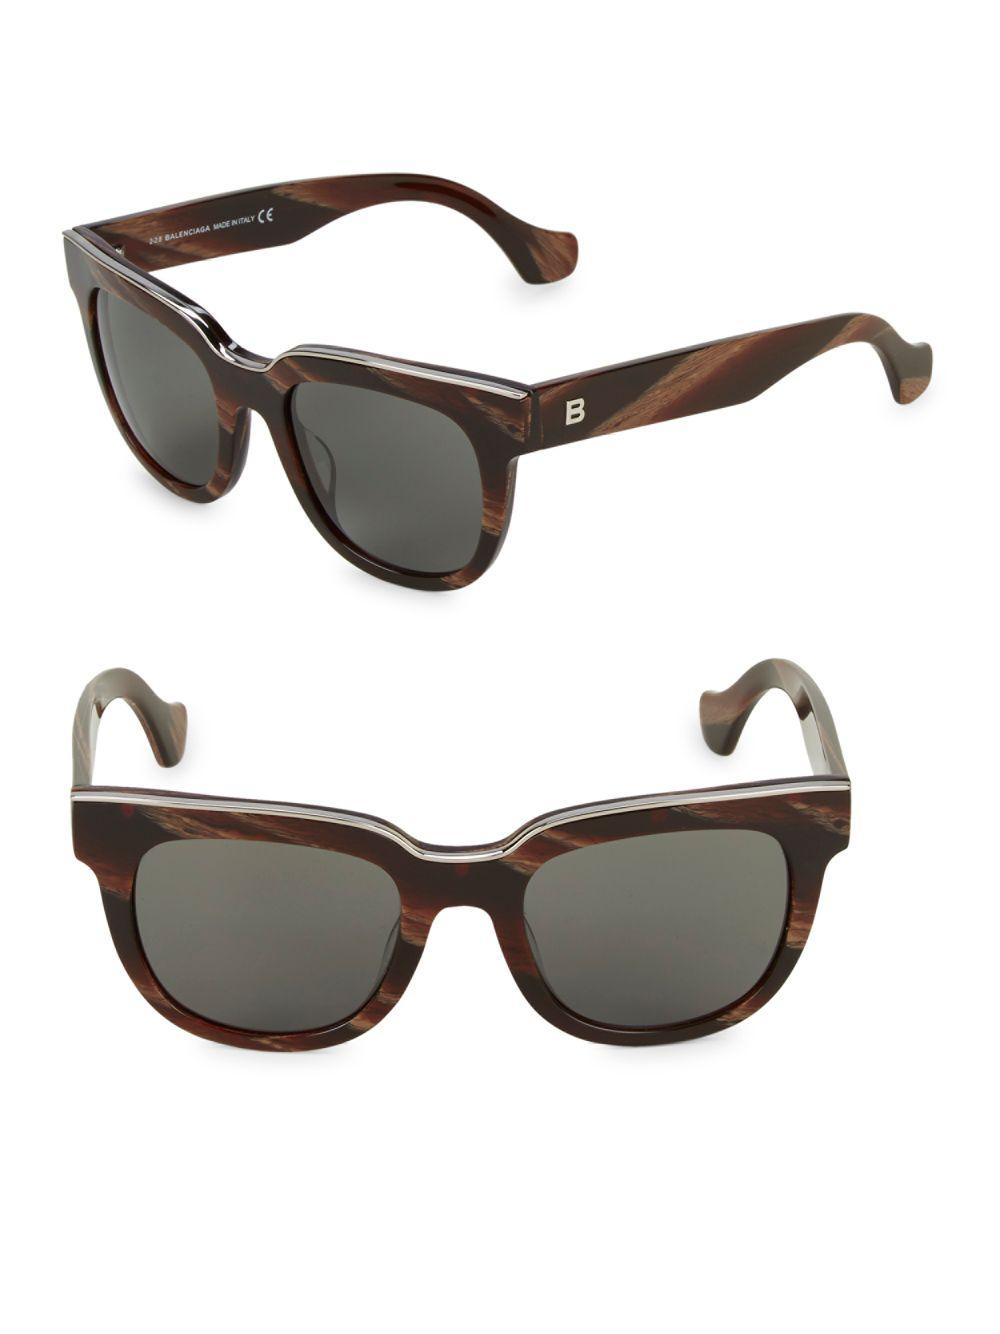 d3577bc90aa Lyst - Balenciaga 50mm Square Sunglasses in Brown